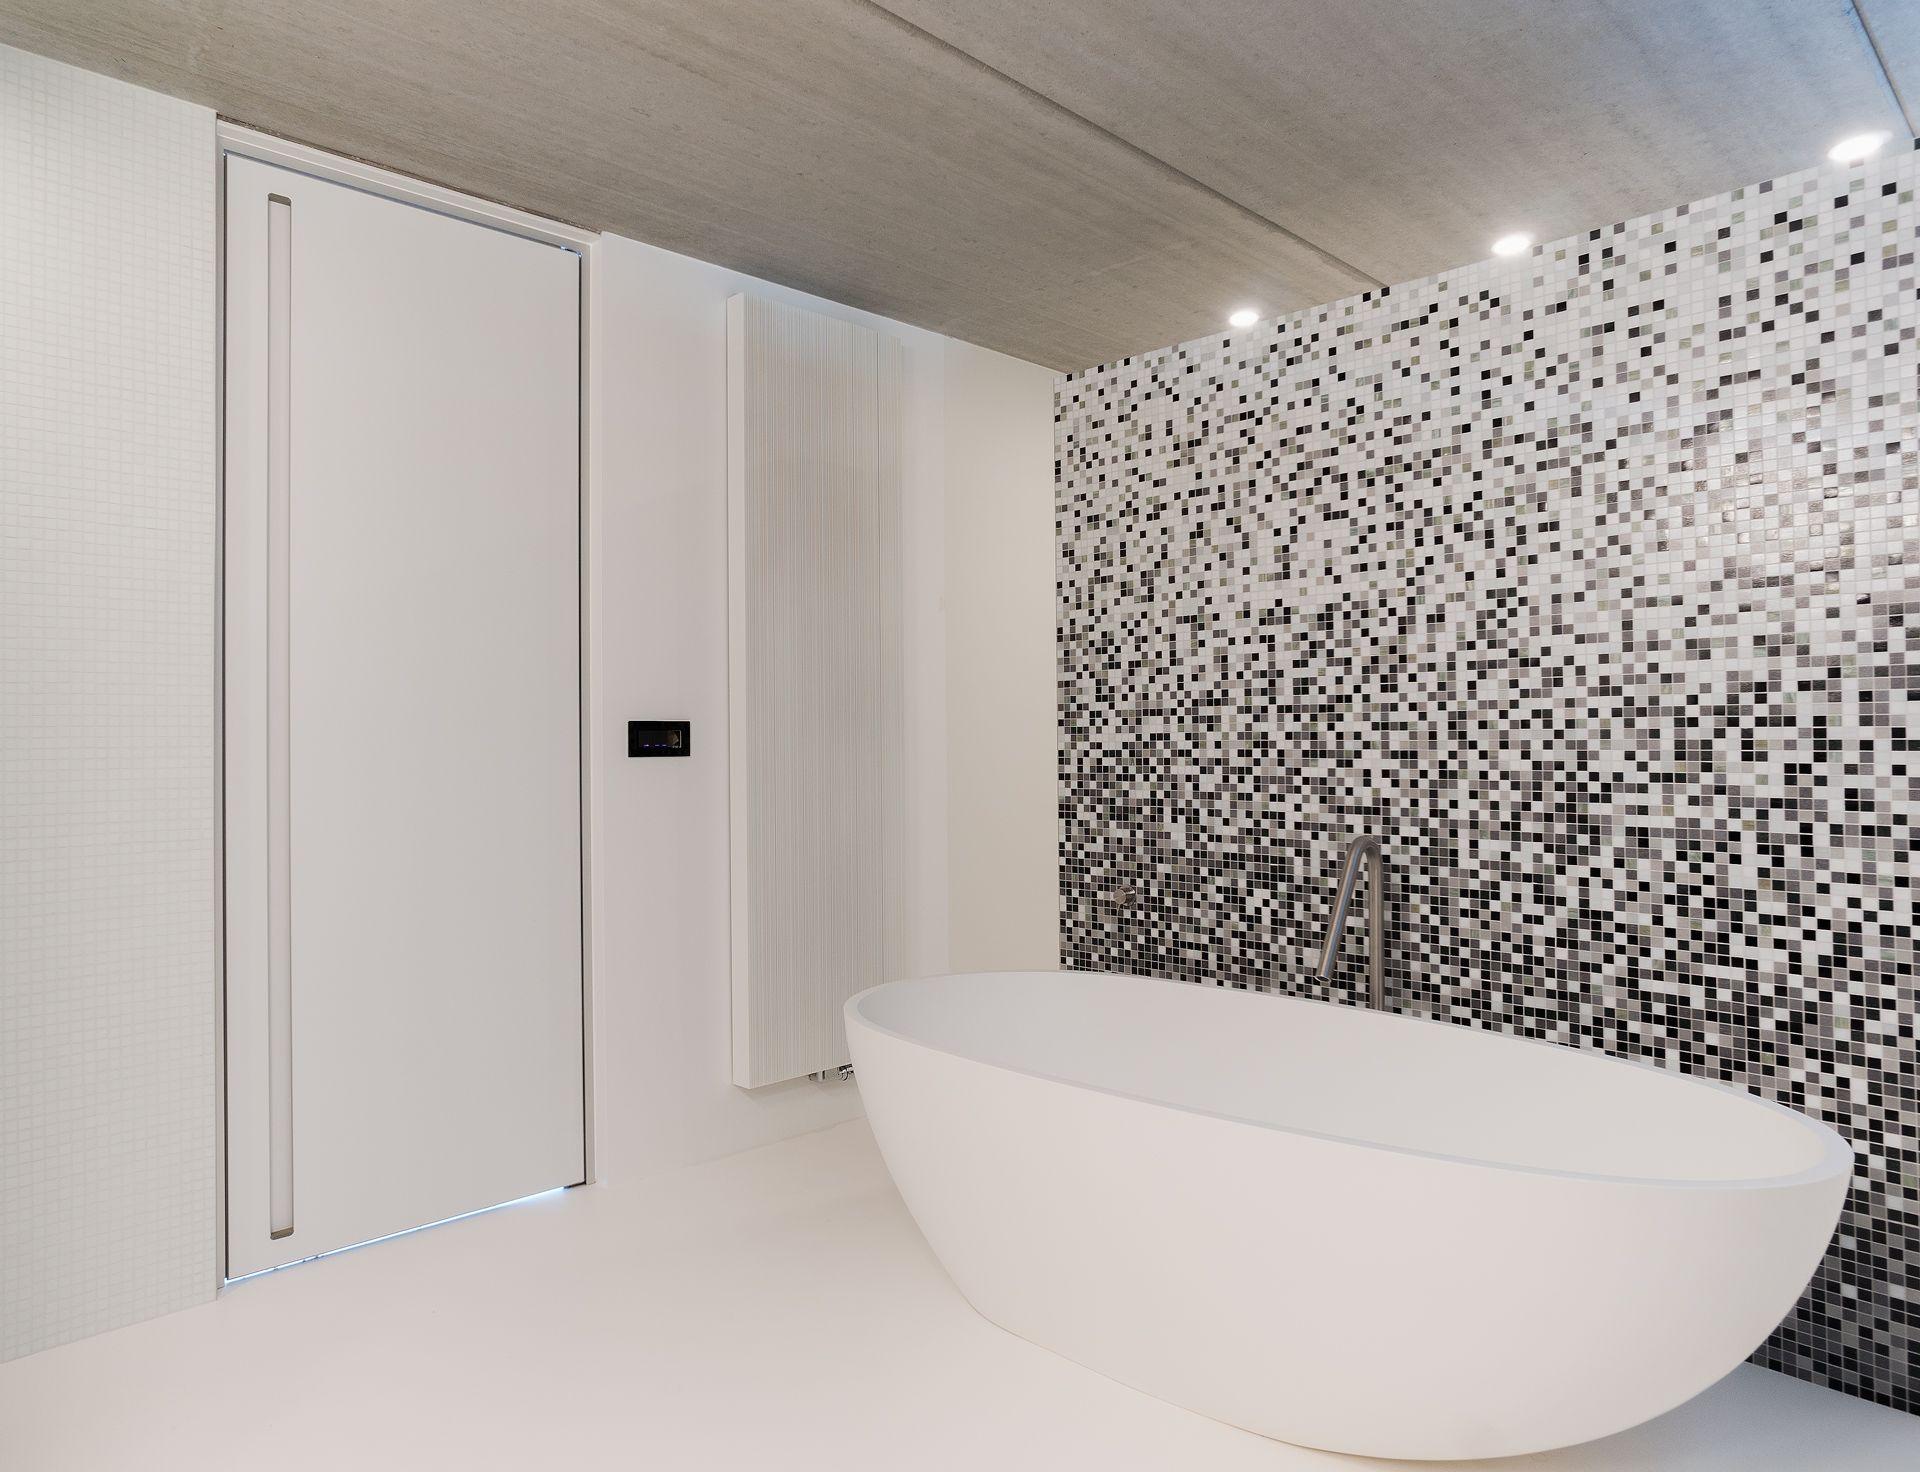 moderne badkamer met wit bad witte gietvloer en zwart wit mozaà ek